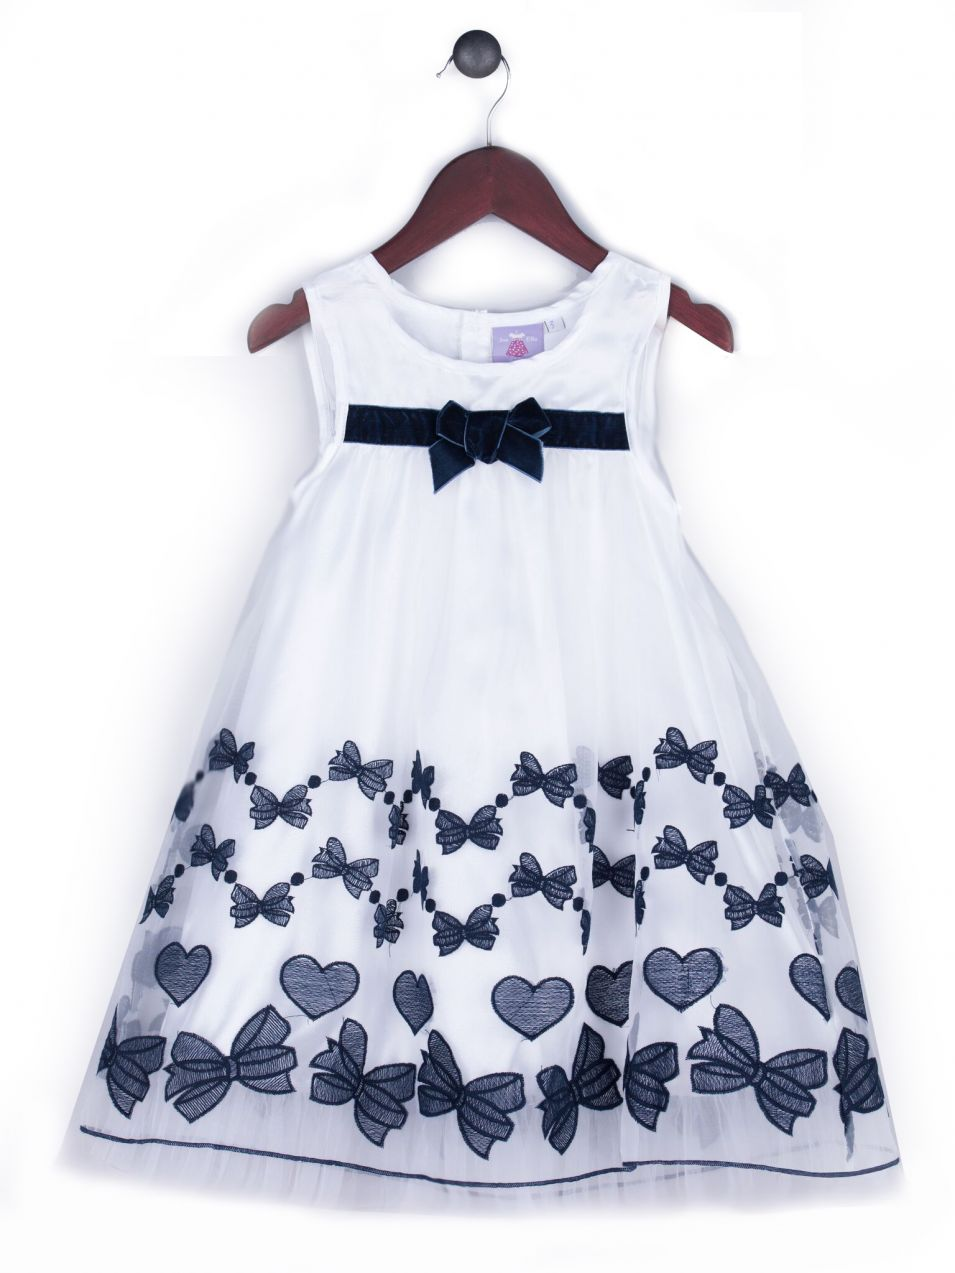 Joe and Ella Fashion Dievčenské šaty Adelle s mašličkami - bielo-čierne d953baf80b9